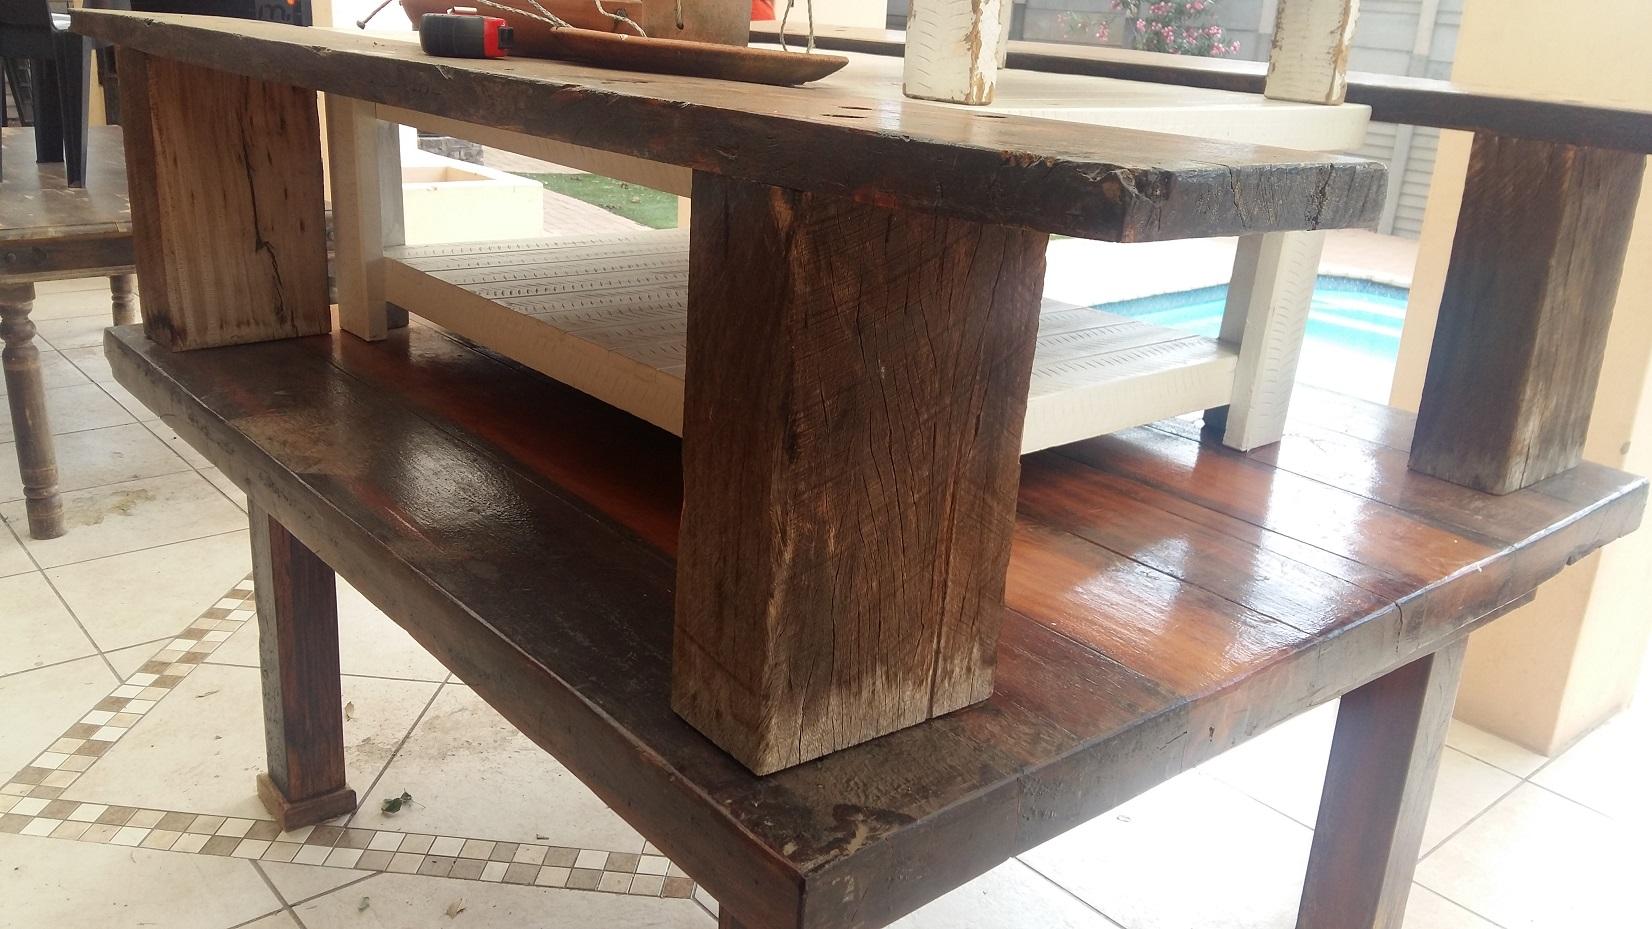 Old Rhodesian Teak Railway Sleeper Table and Chairs